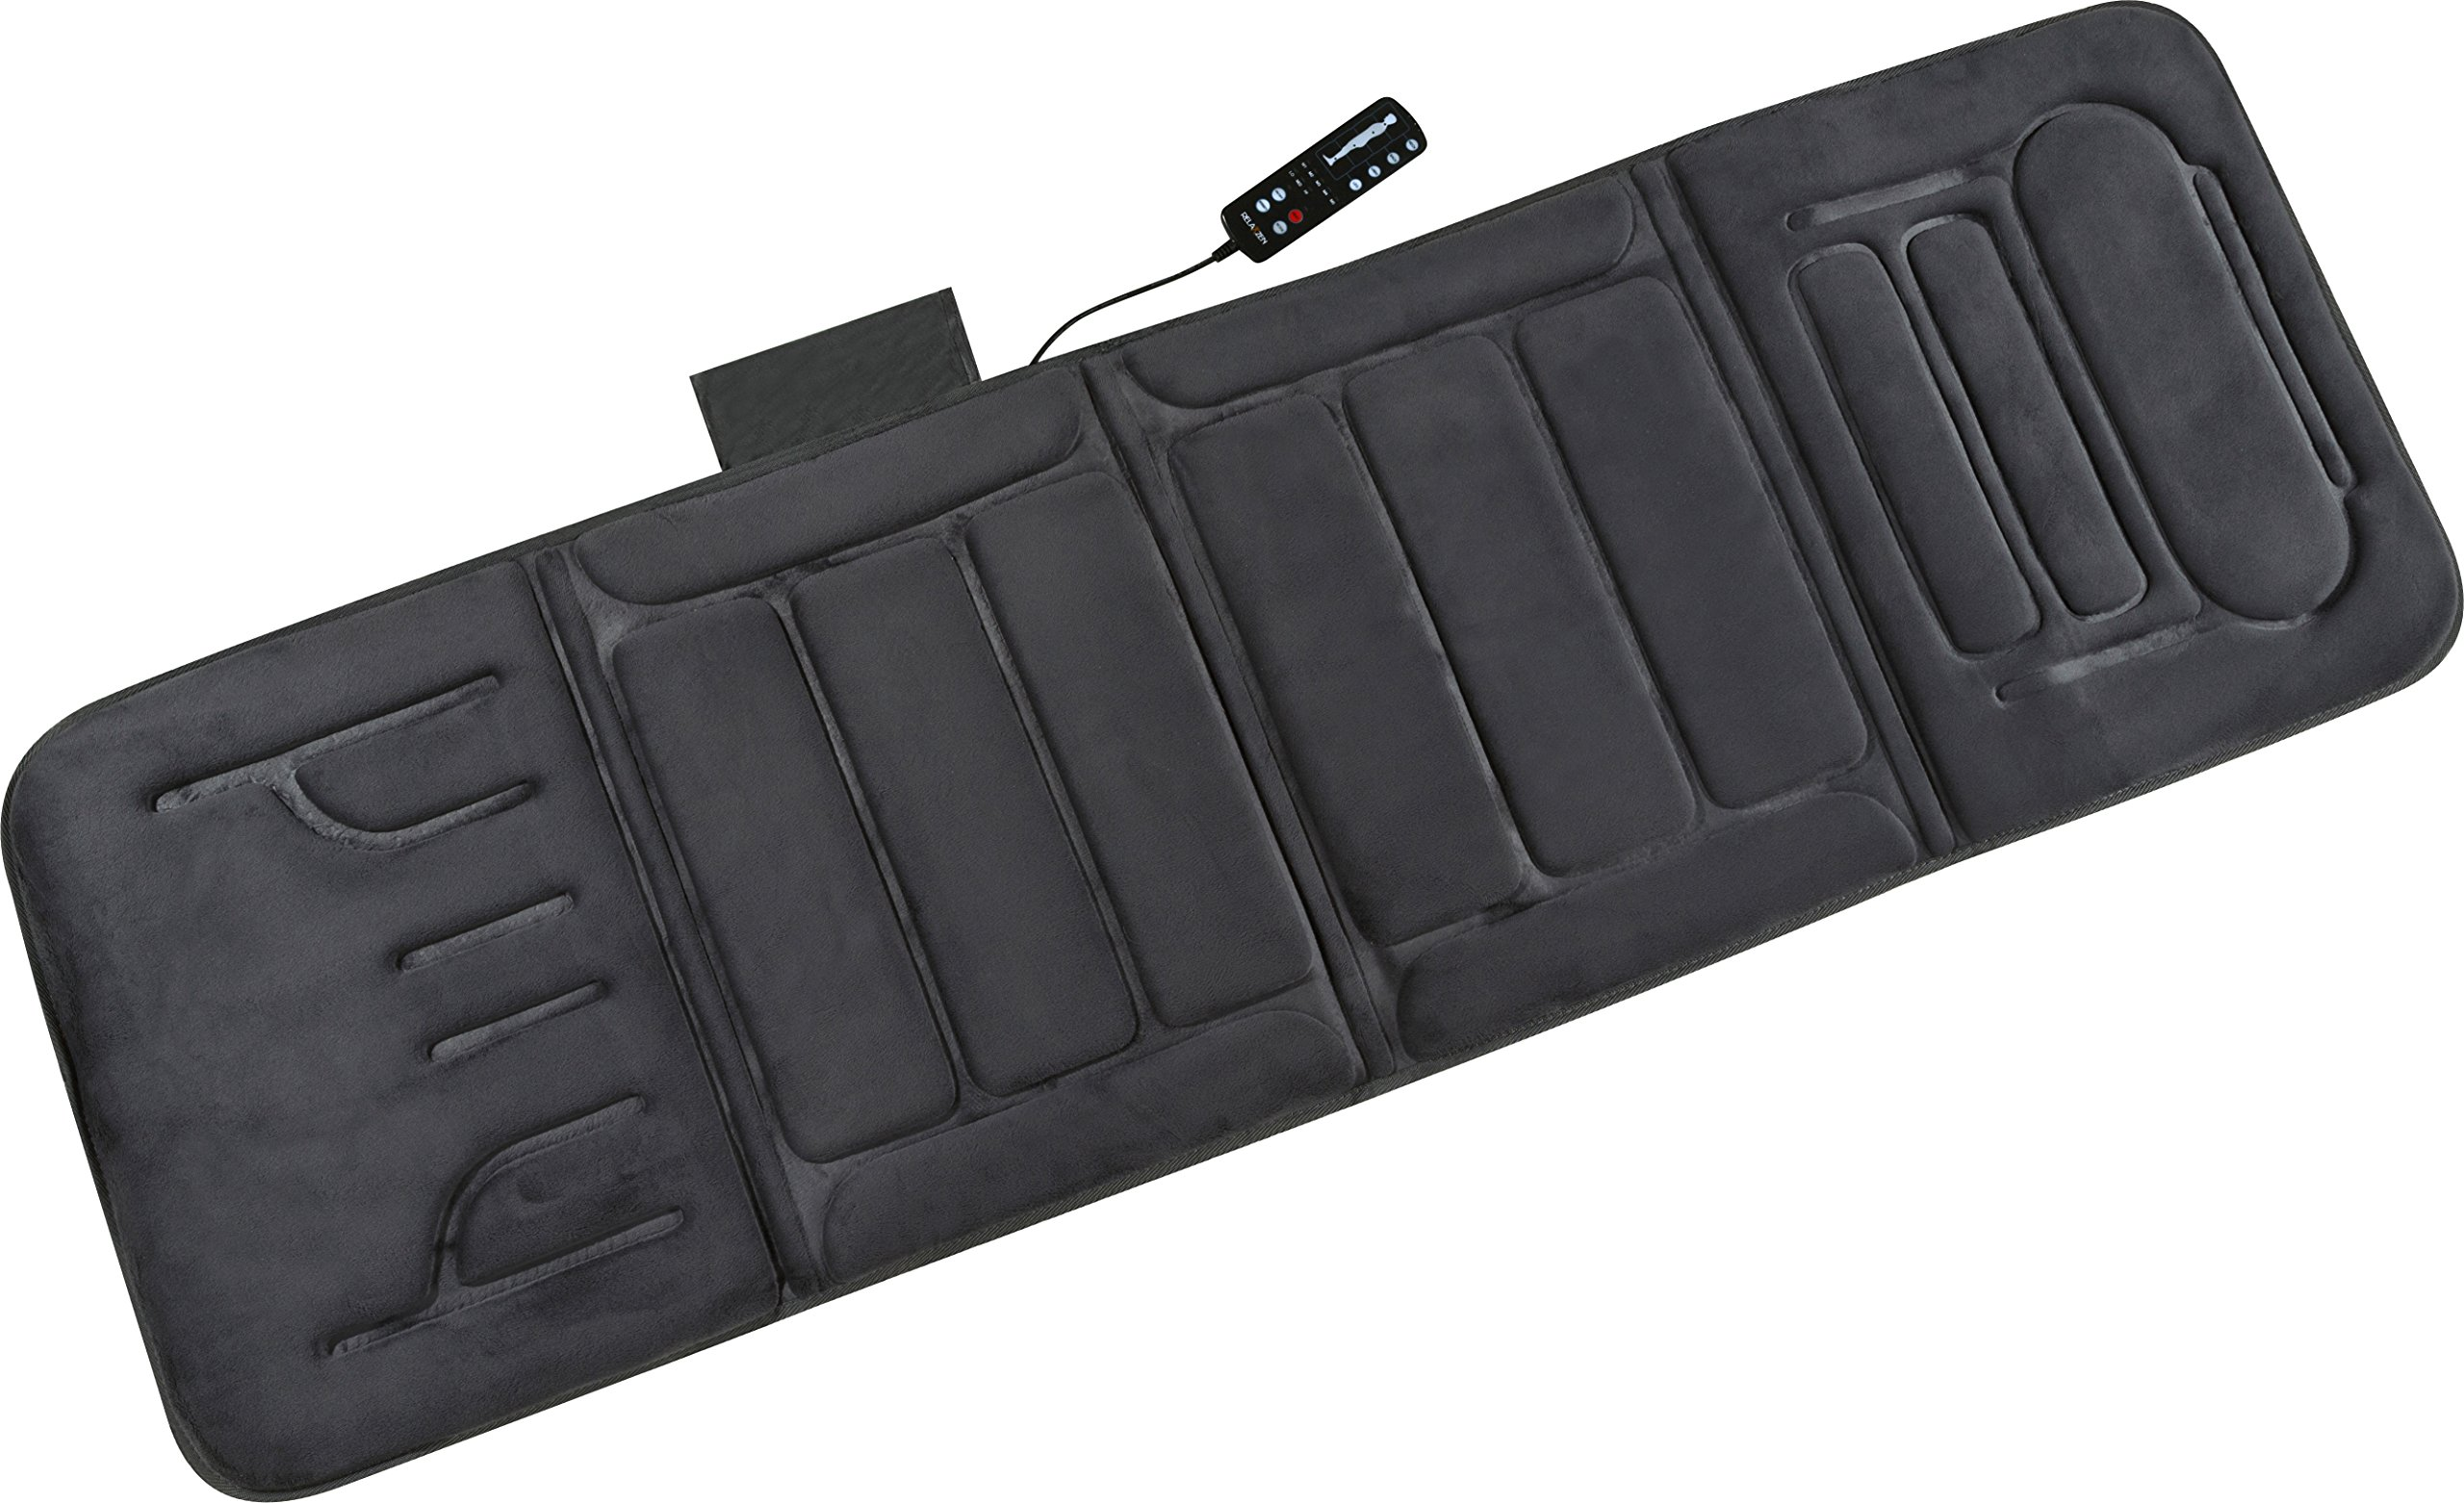 Portable Heated Massage Mat Vibrating Bed Pad Back Body